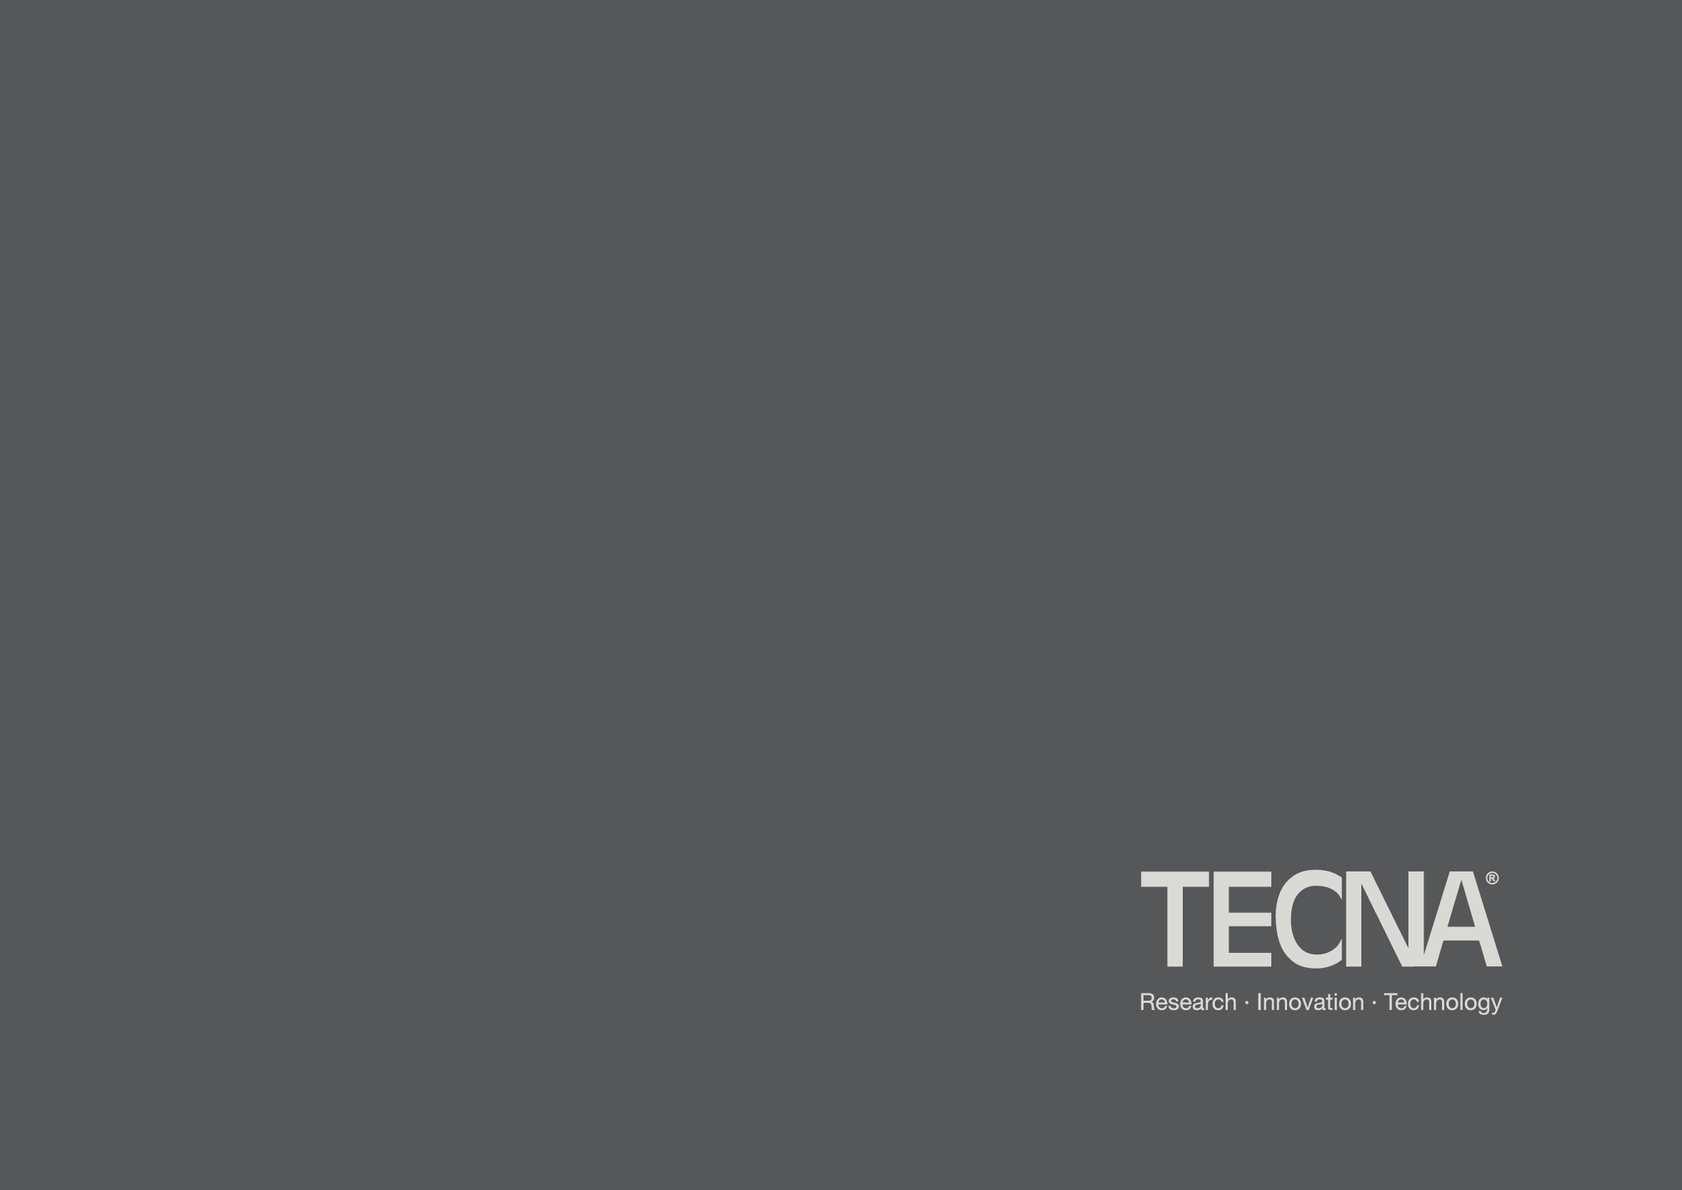 TECNA - Company Profile